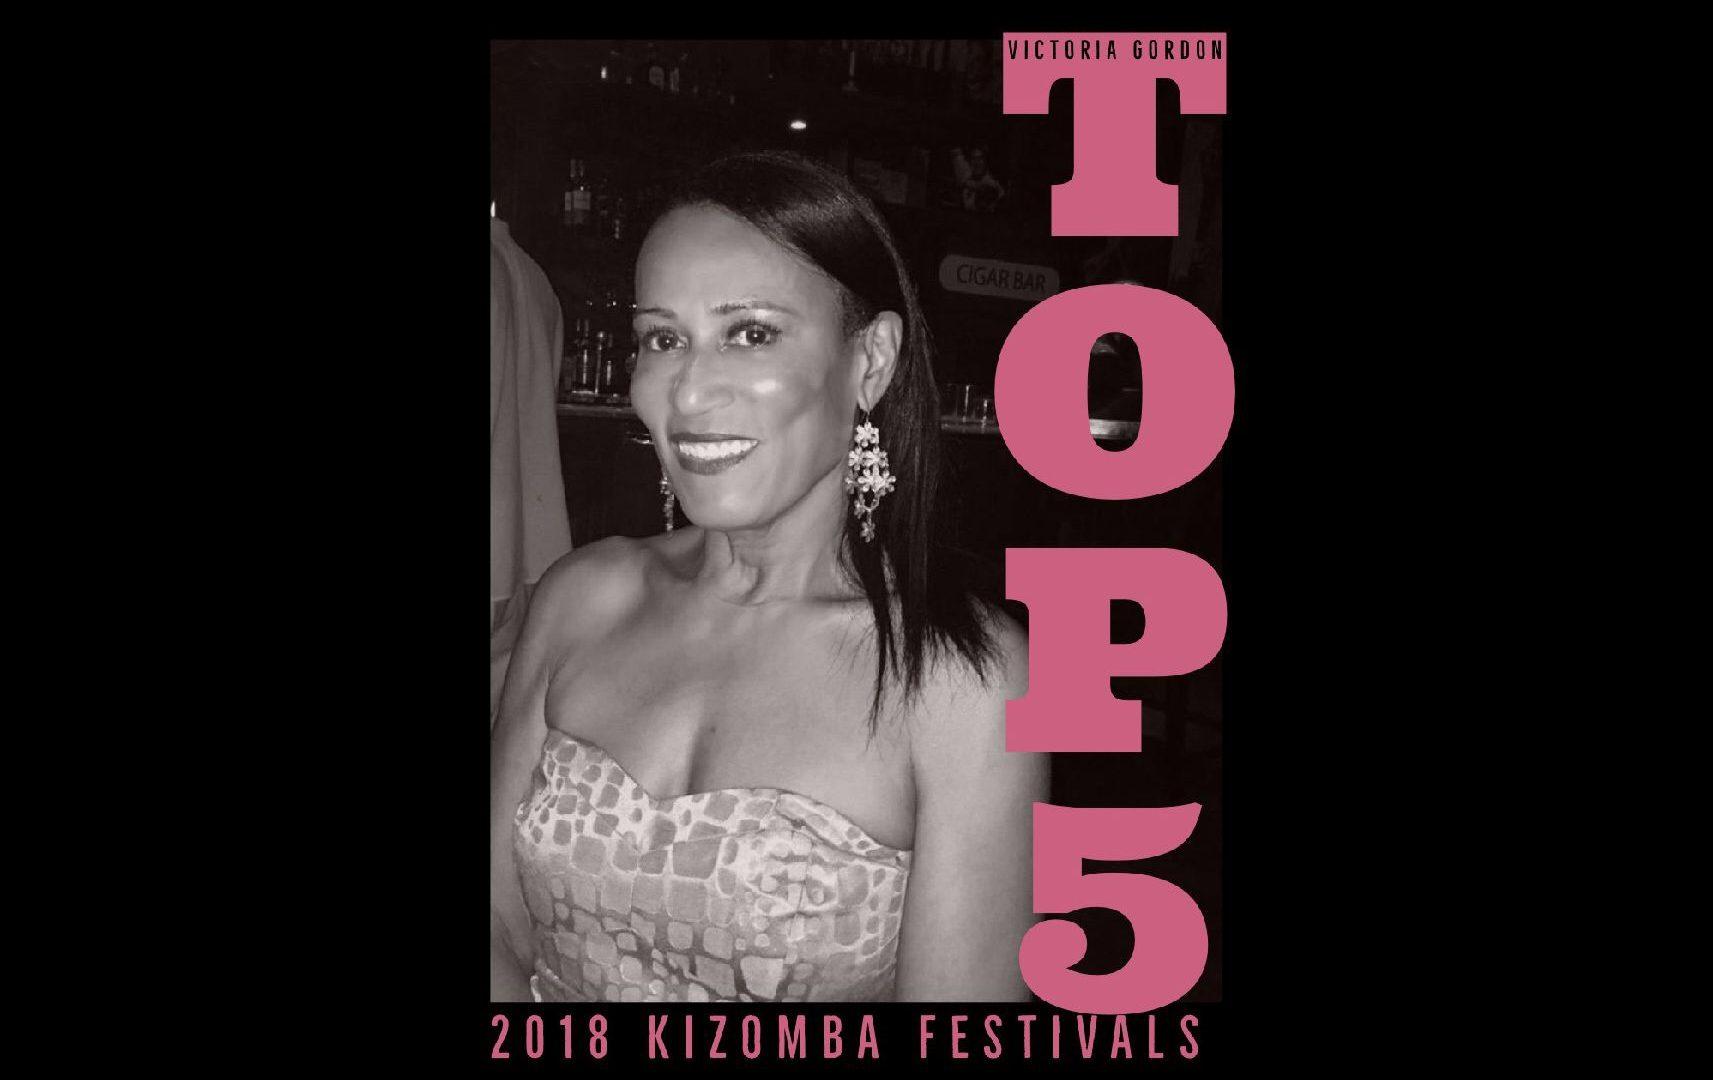 TOP 5 KIZOMBA FESTIVALS 2018 BY VICTORIA GORDON